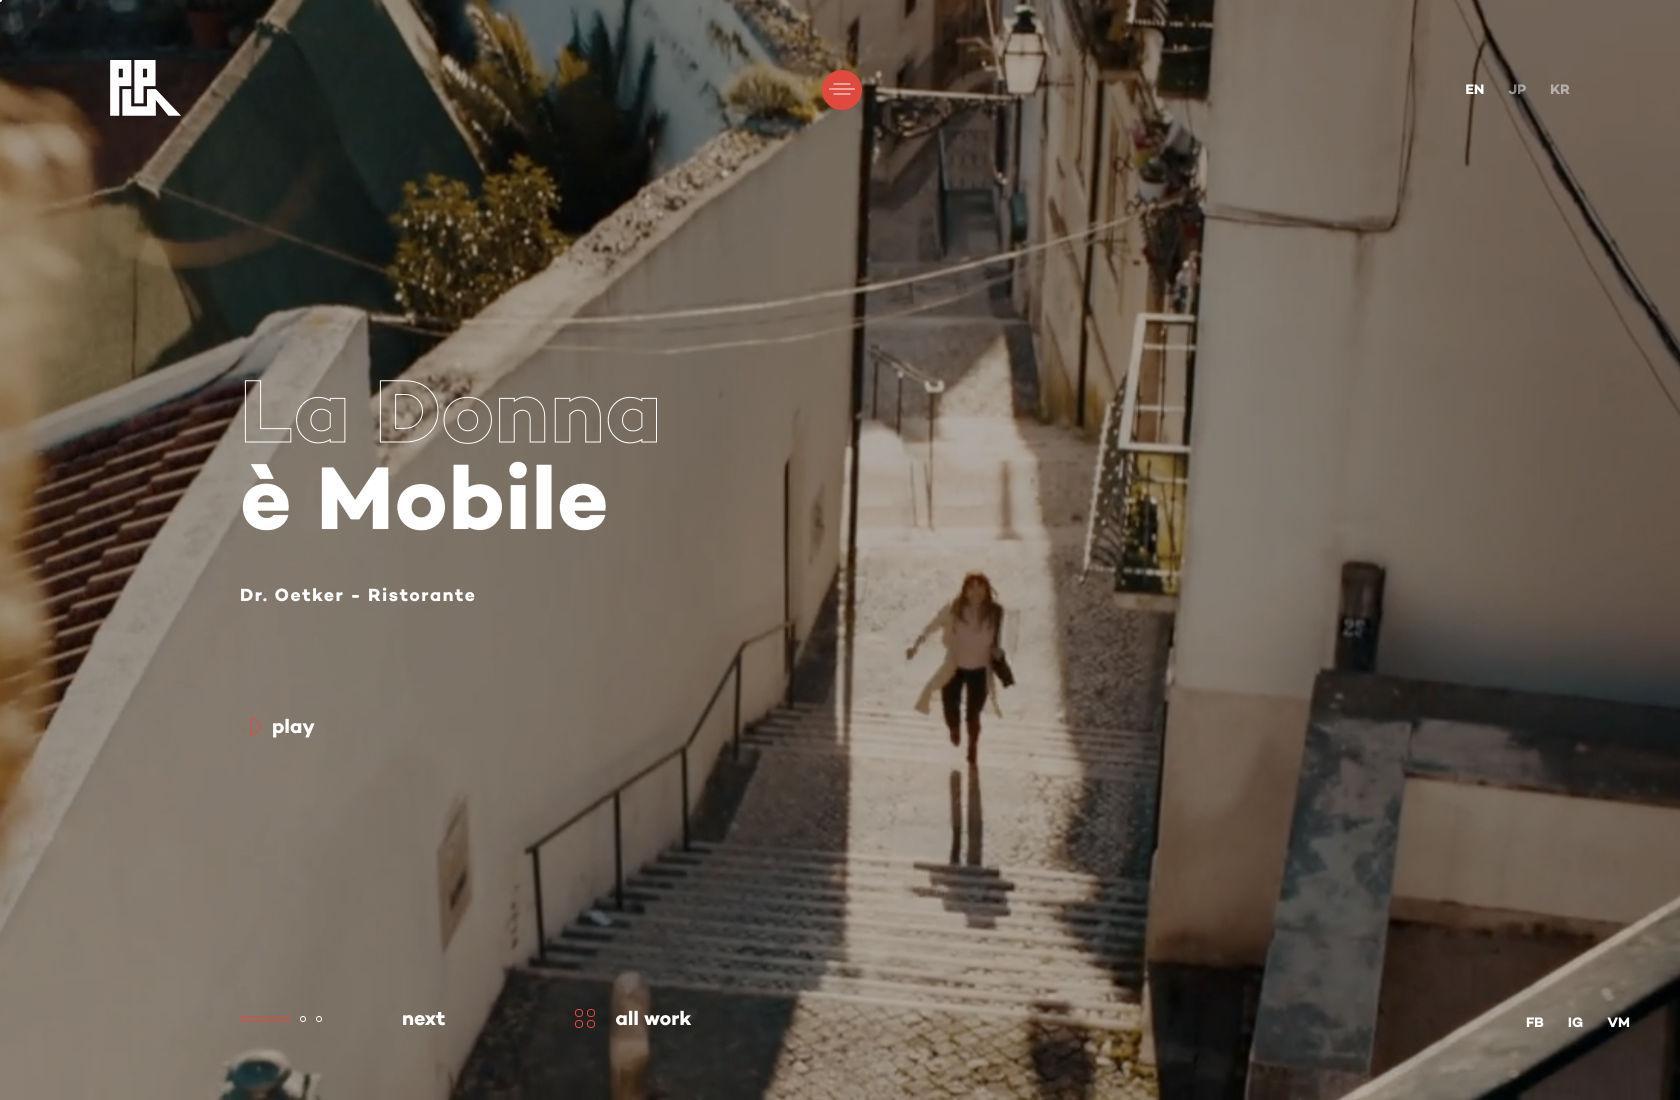 Tren desain situs web: Latar belakang video.